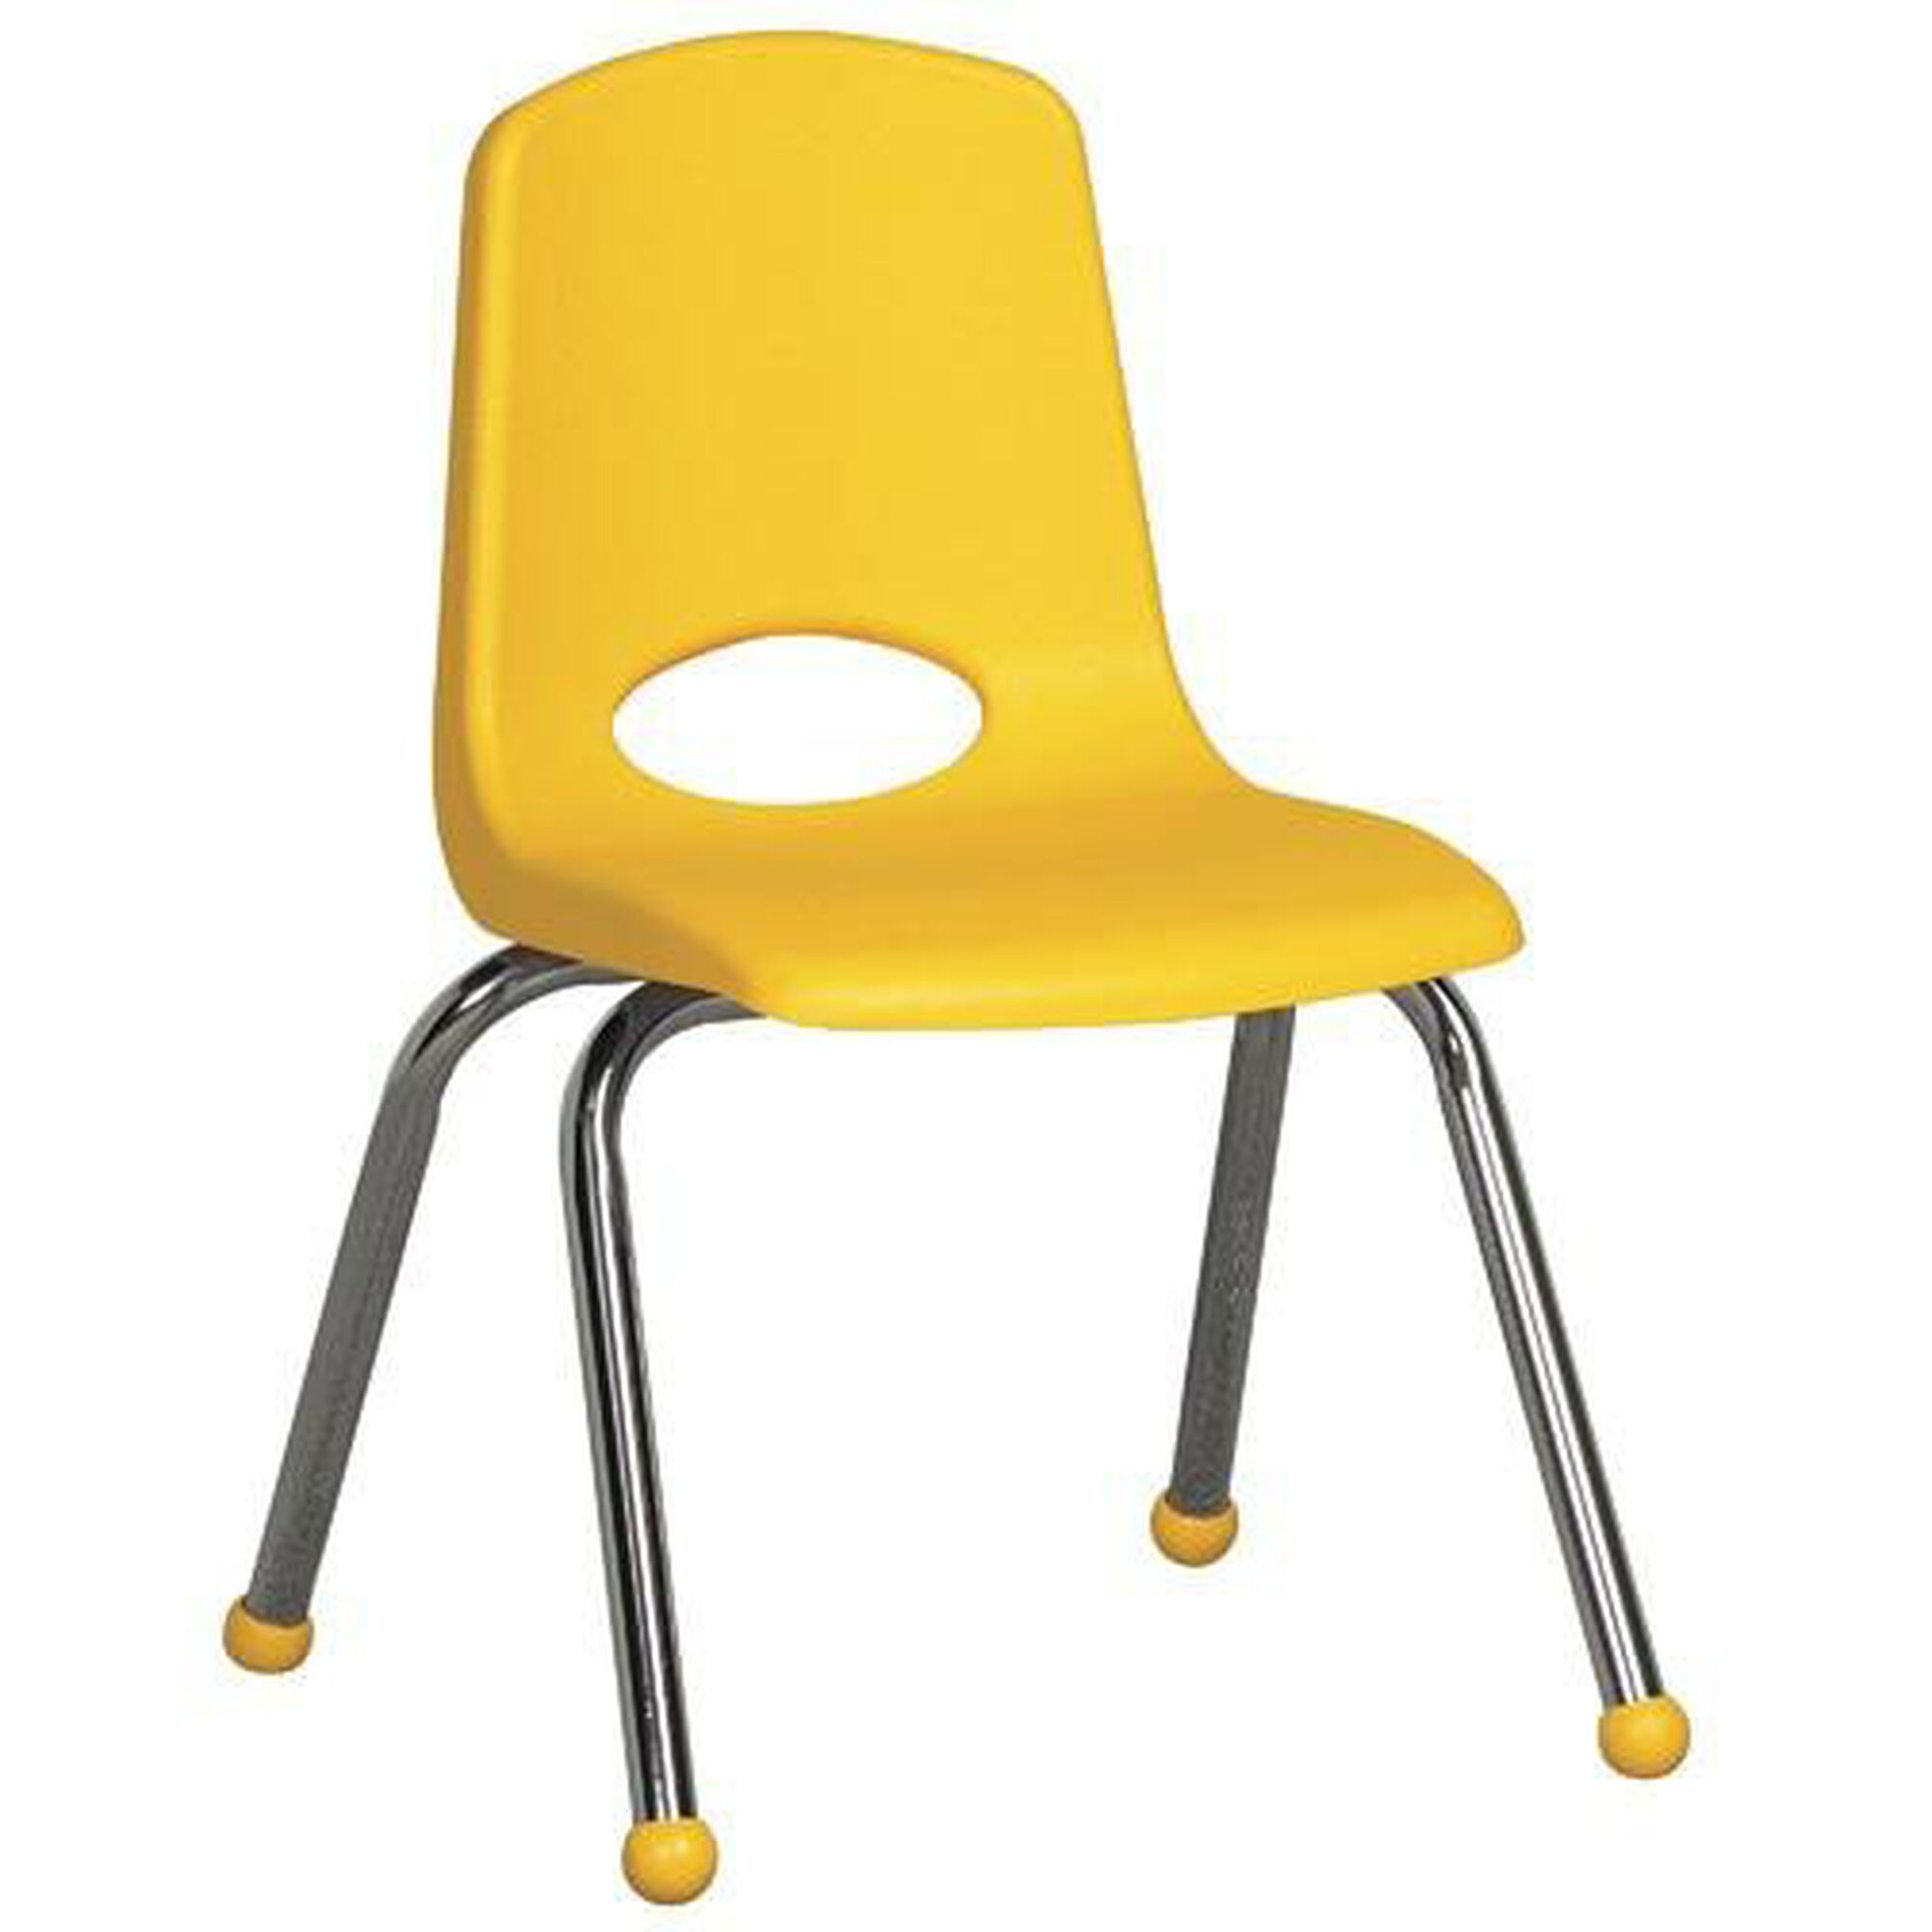 Stackable Yellow Plastic Chair Elr 0194 Ye Bizchair Com